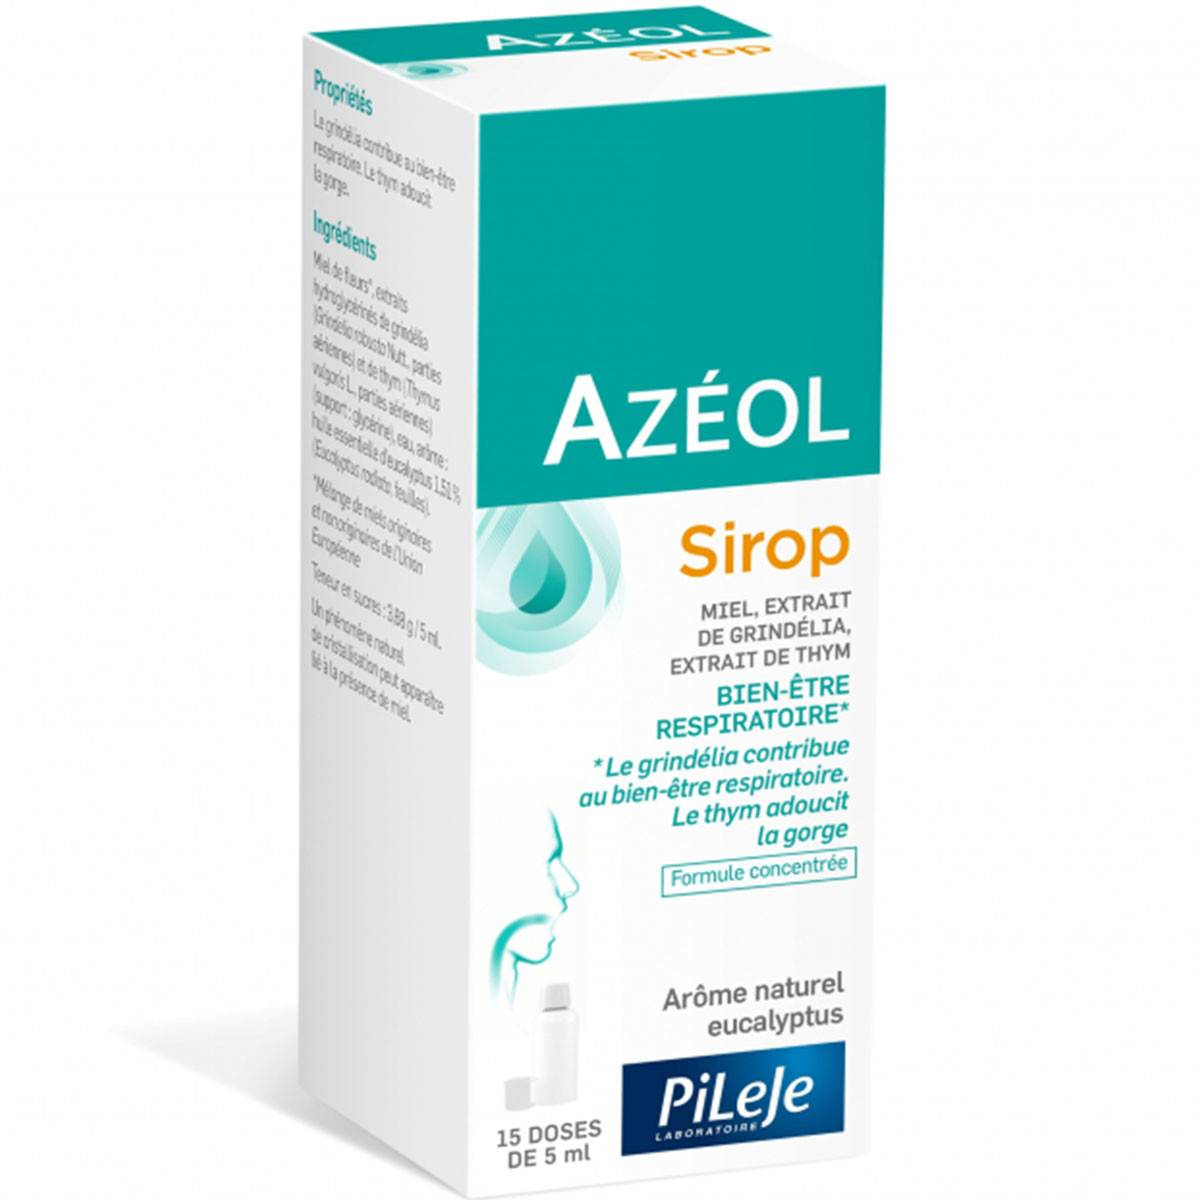 DIVERS Azeol sirop 75ml